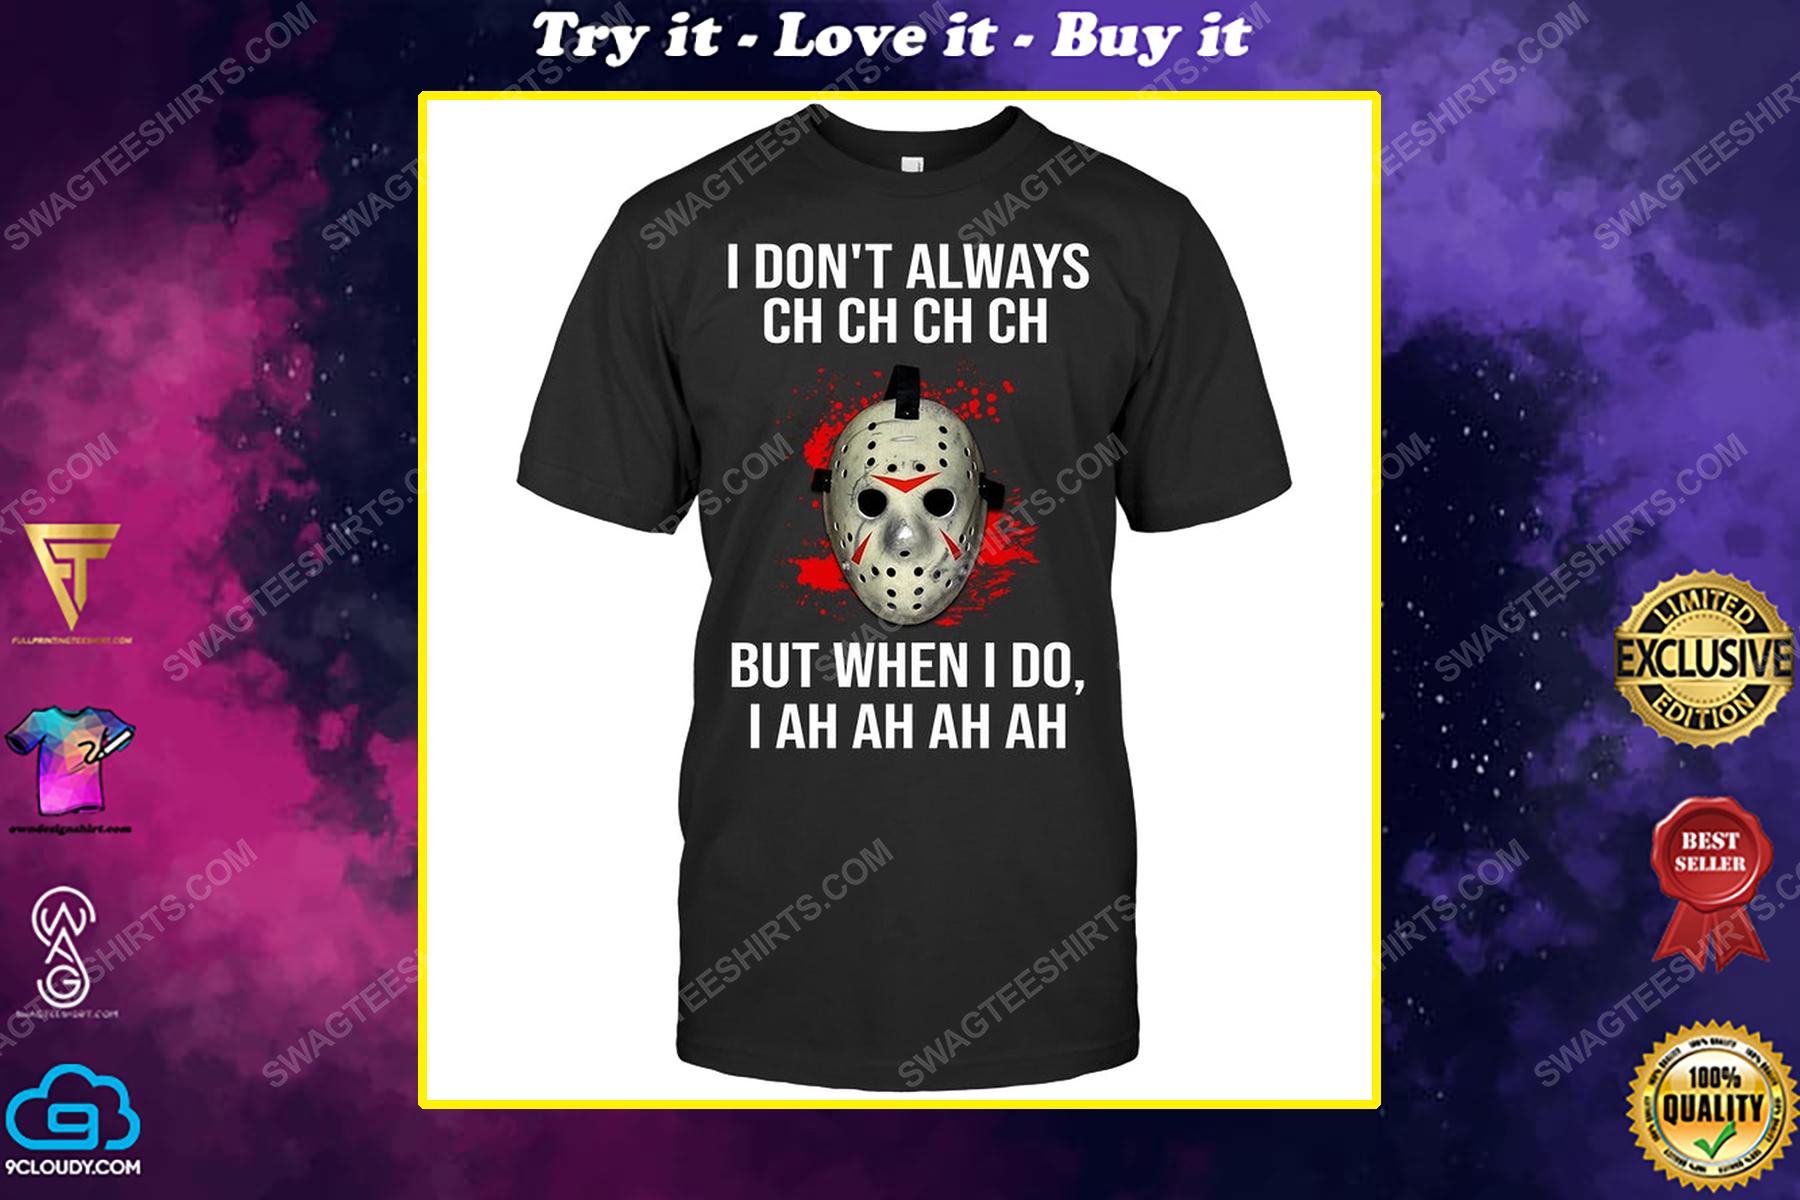 I don't always ch ch ch ch but when i do i ah ah ah ah jason voorhees shirt